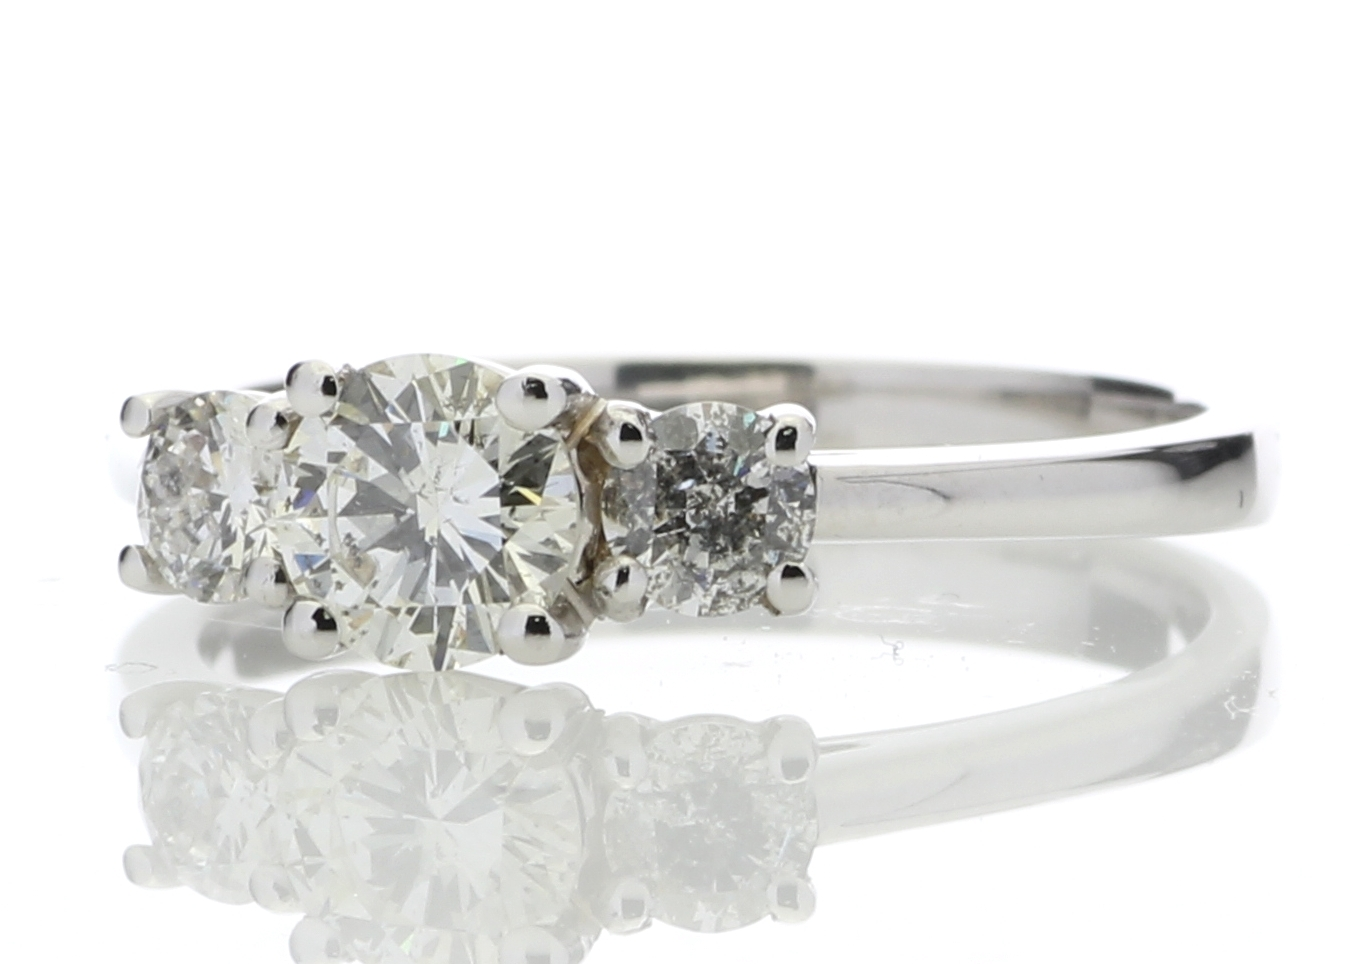 18k White Gold Three Stone Claw Set Diamond Ring 0.77 Carats - Image 2 of 5